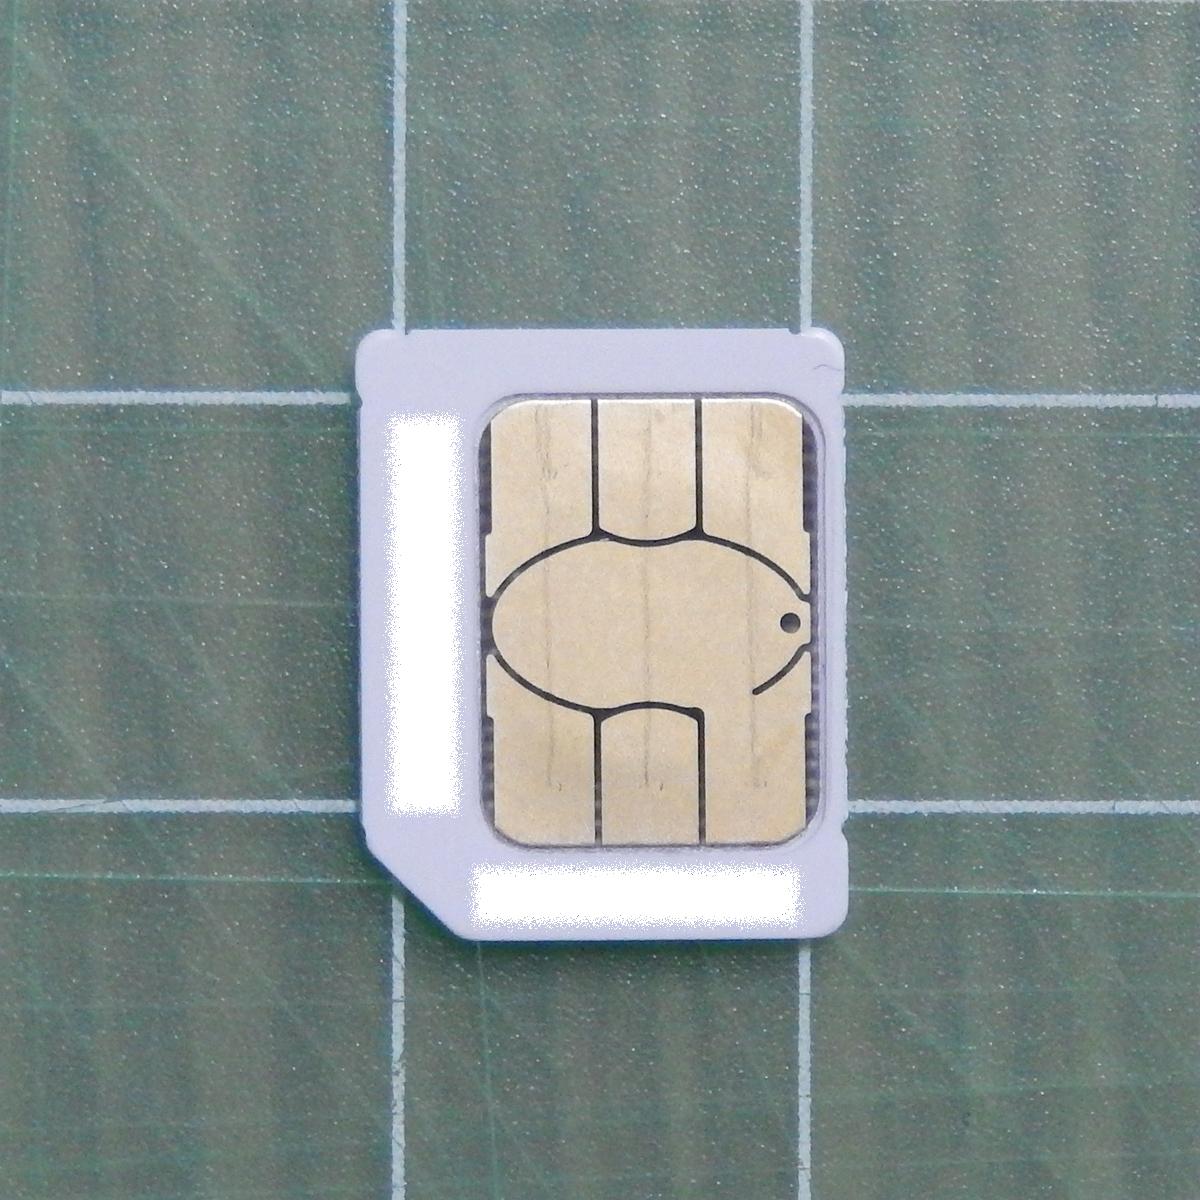 SoftBank(ソフトバンク) 解約済み micro SIMカード [送料無料・ネコポス(匿名配送)]_画像2